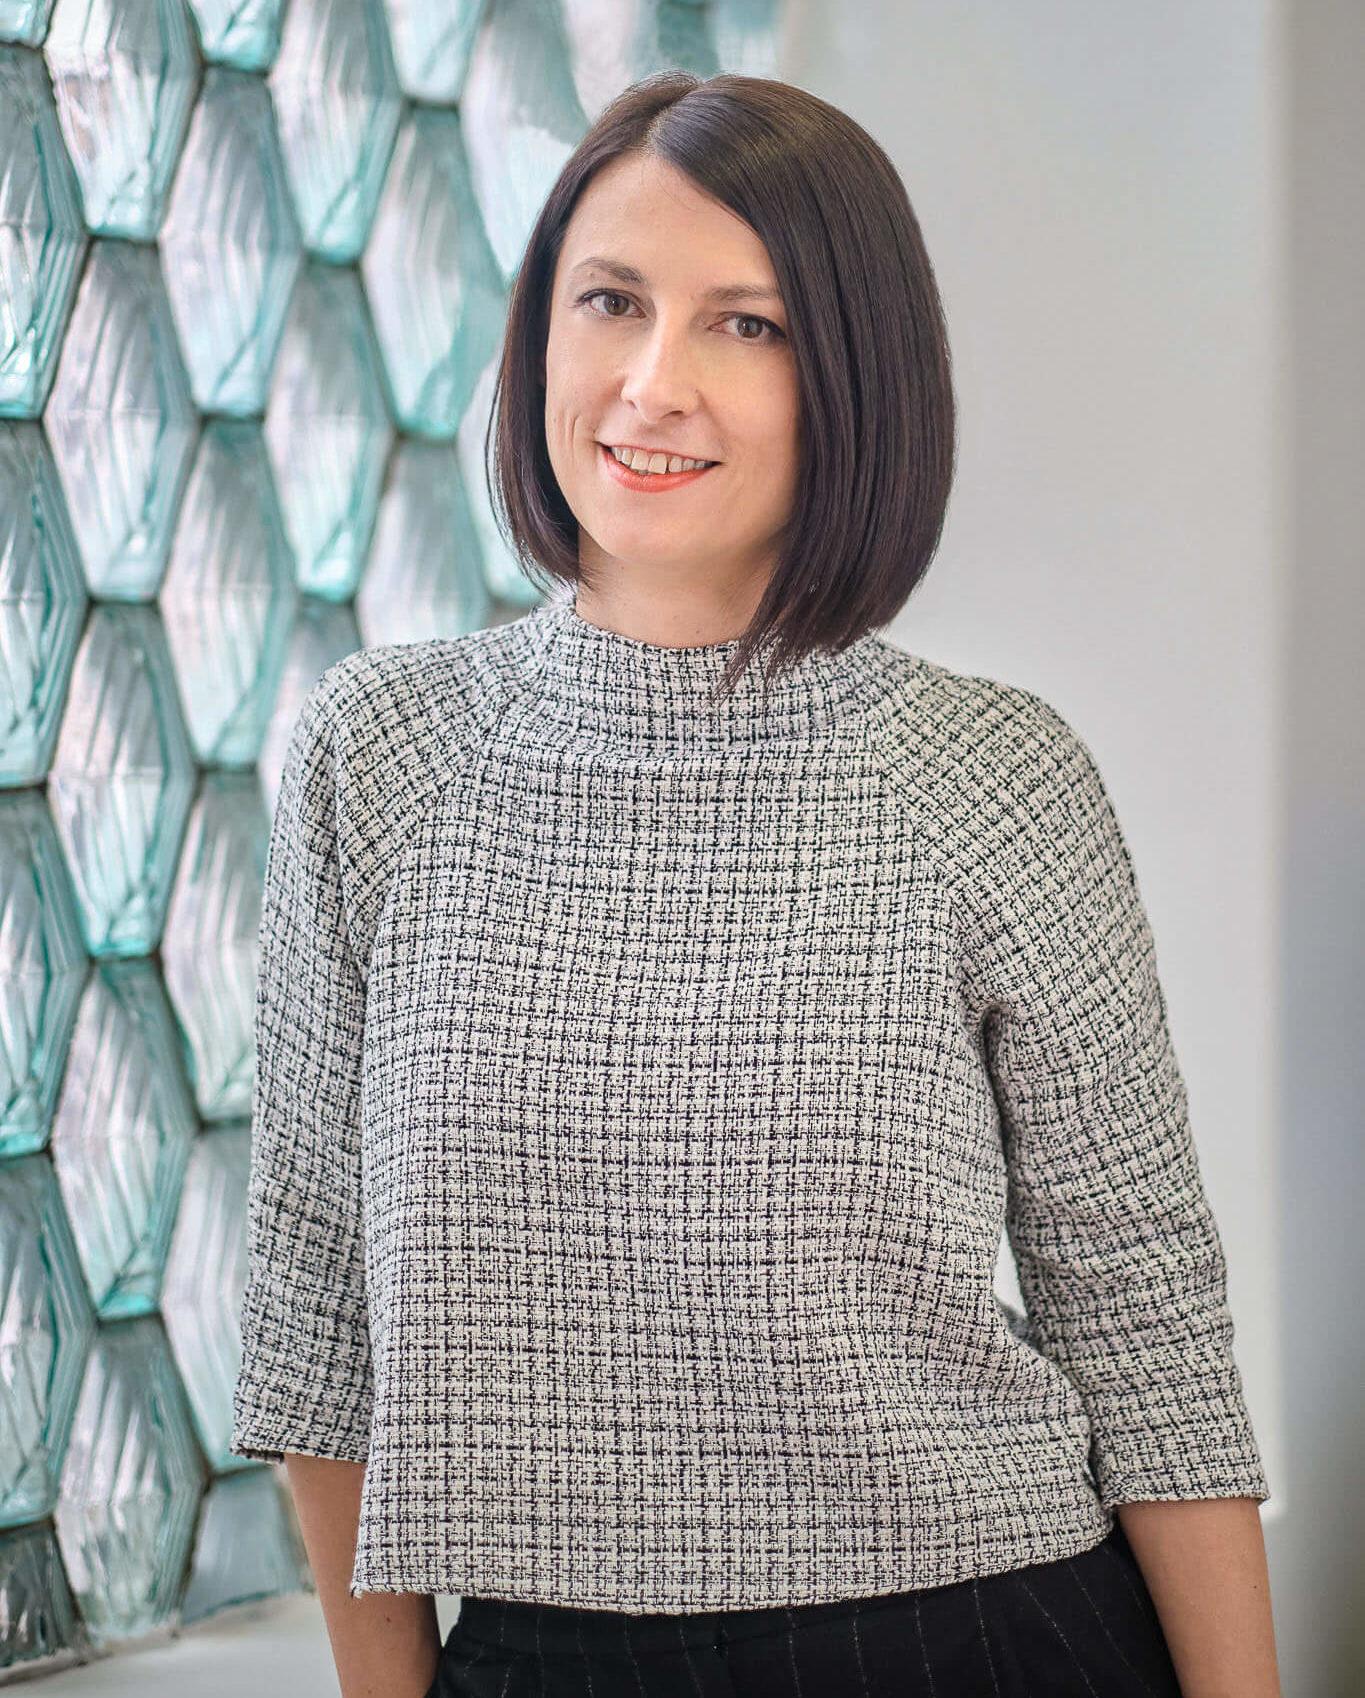 Ivana Novoselec